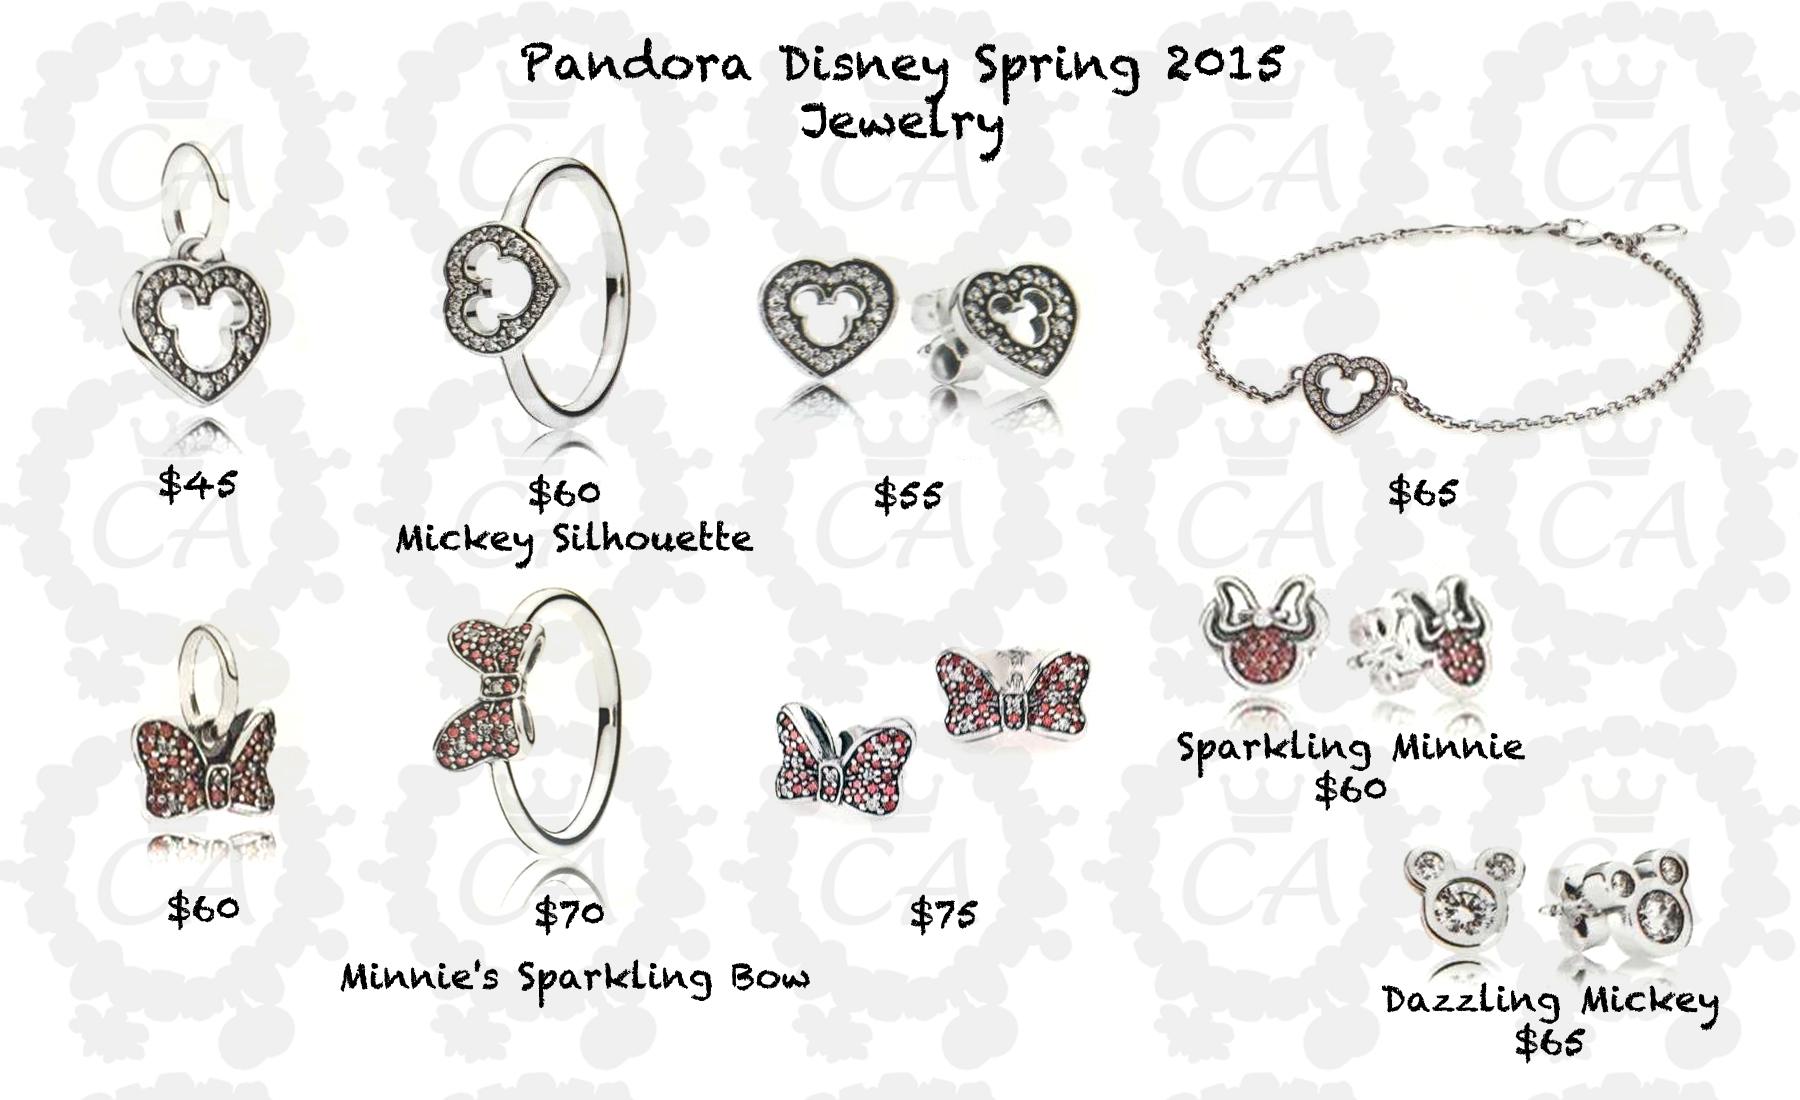 pandora disney park exclusive charms 2015